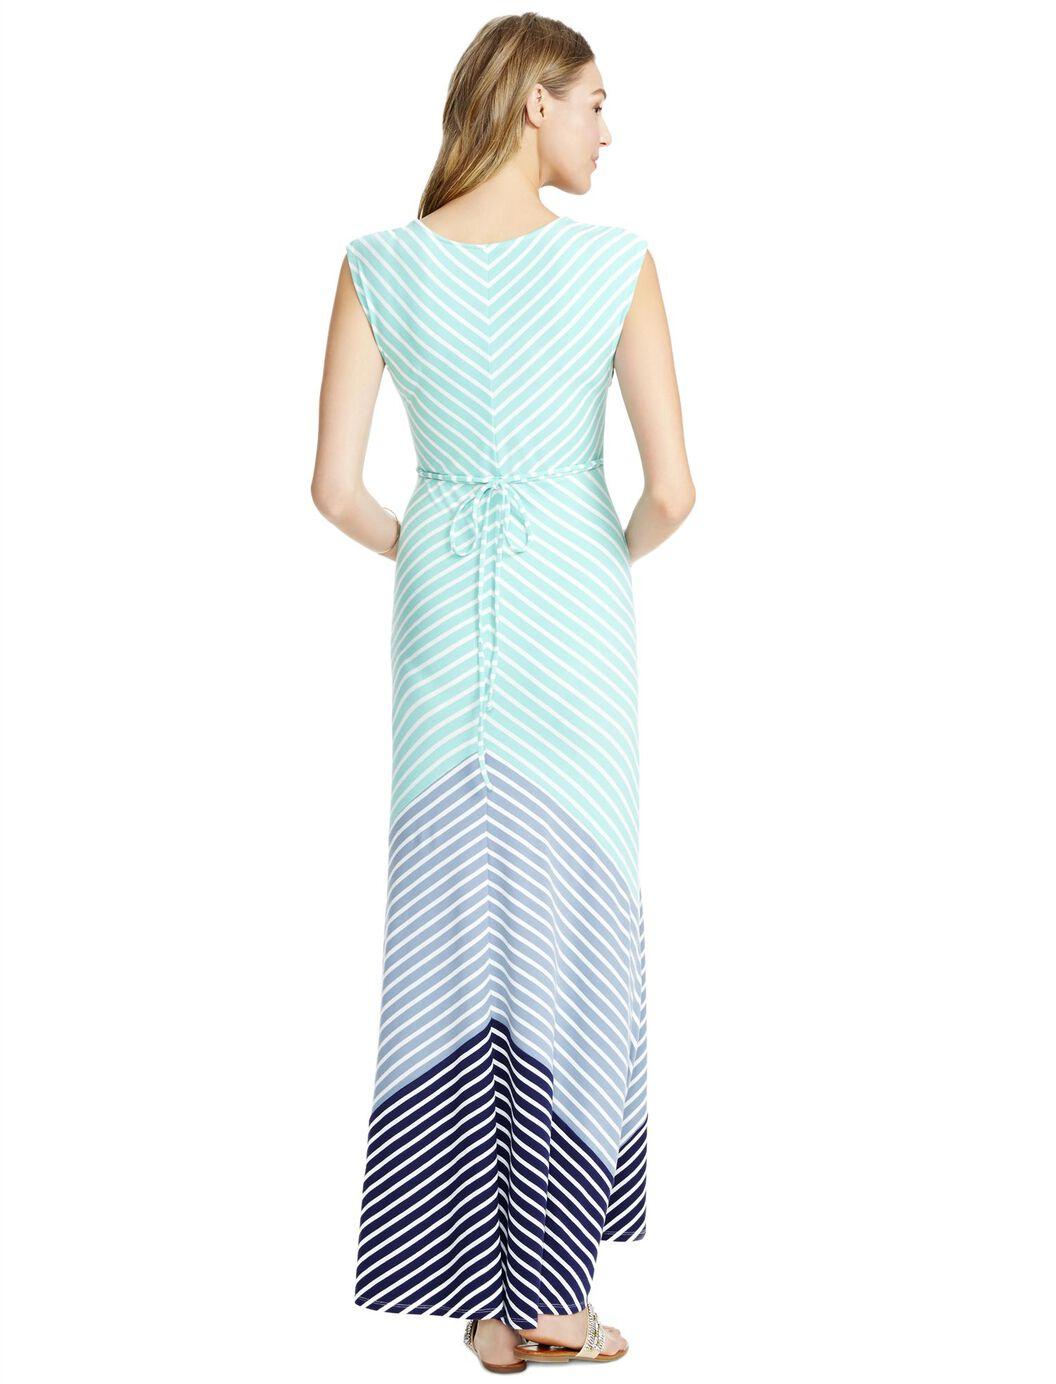 Jessica simpson bias cut maternity maxi dress motherhood jessica simpson bias cut maternity maxi dress blue stripe ombrellifo Choice Image